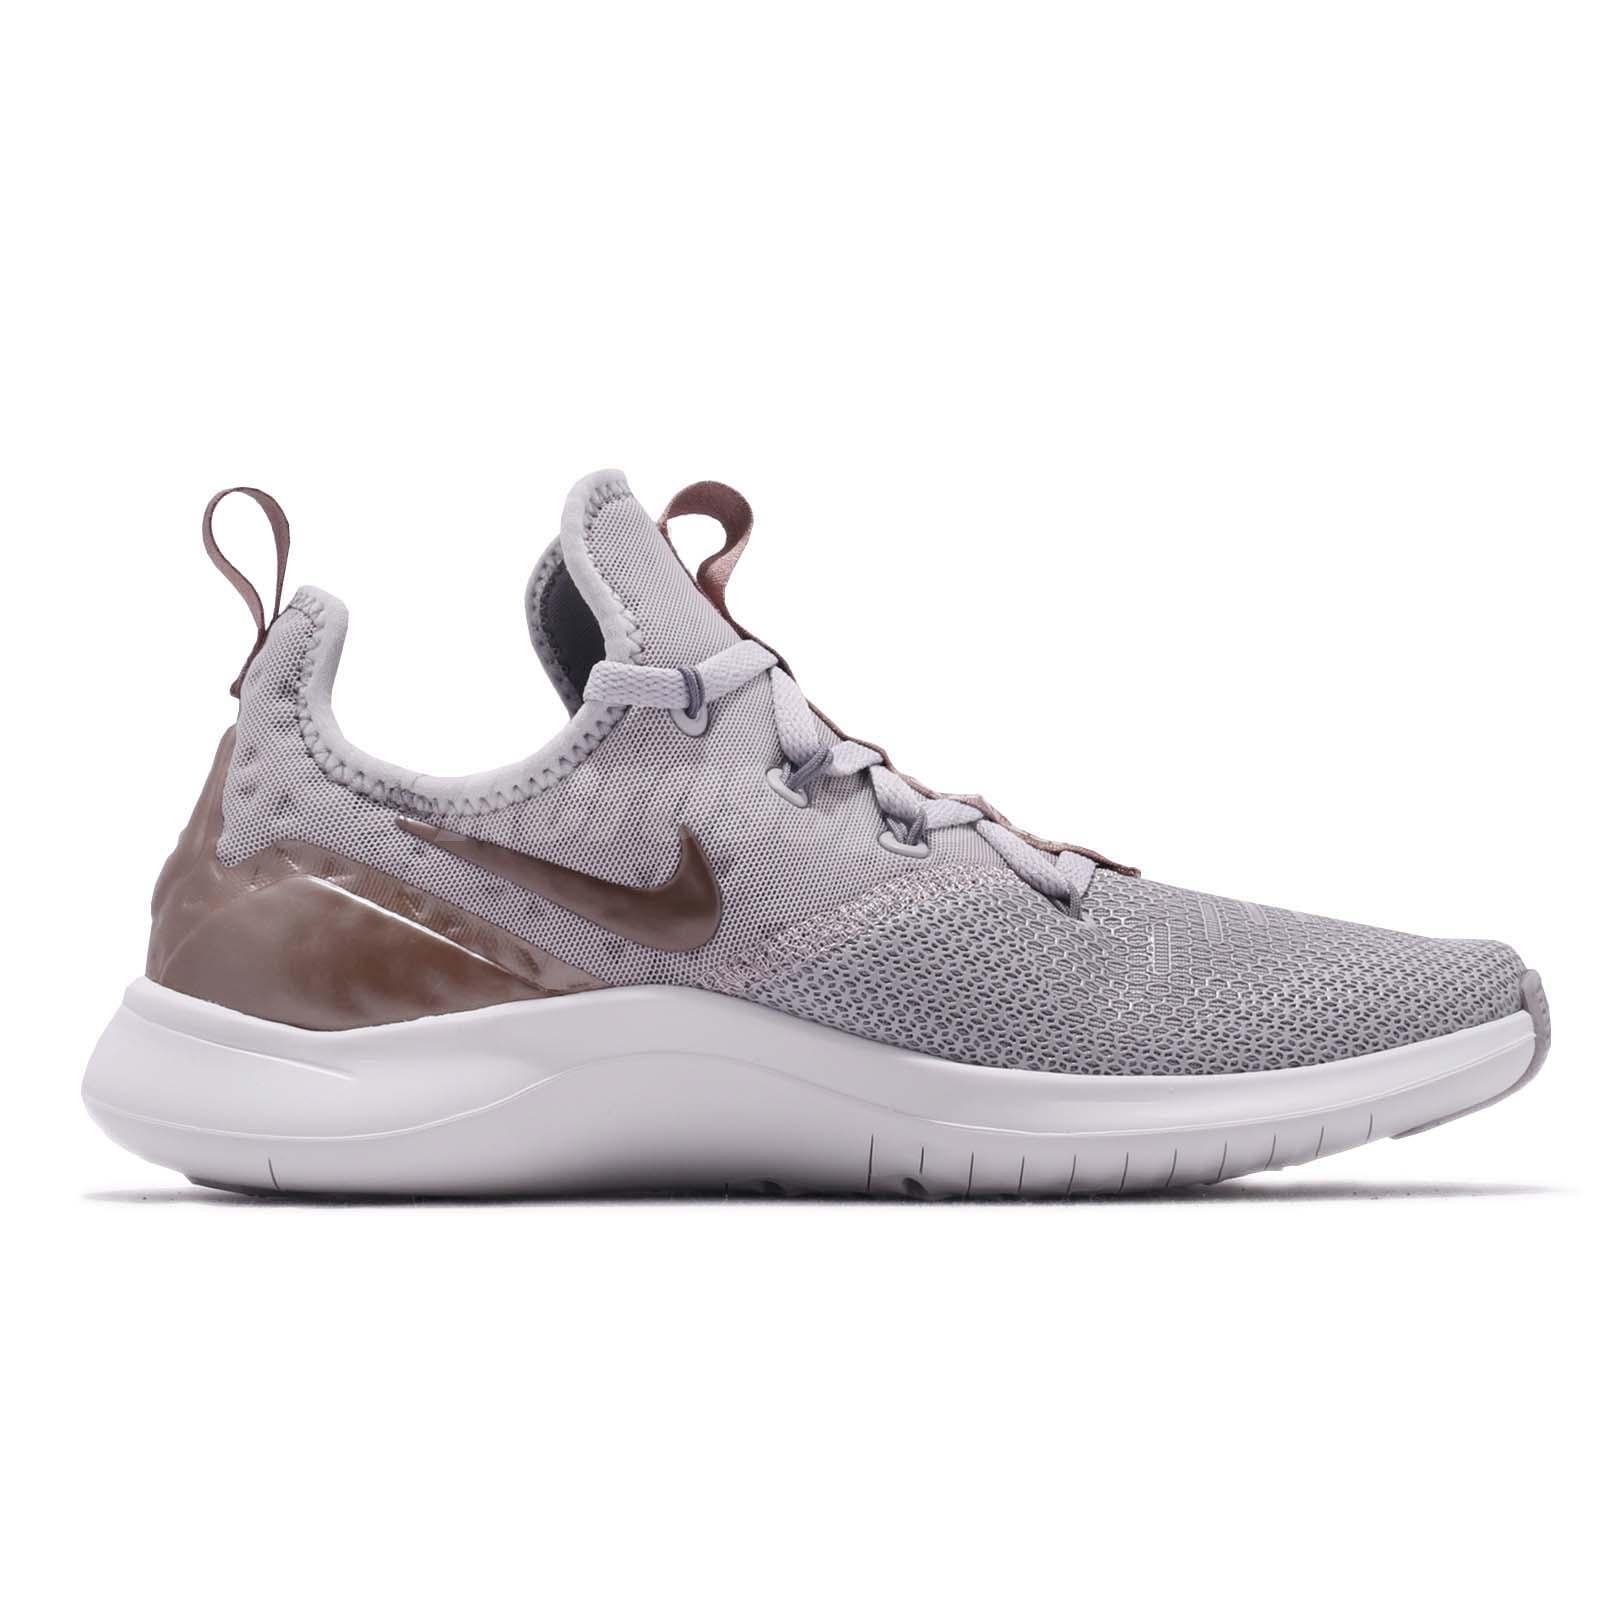 fdc860e41544 Nike Wmns Free TR 8 LM Grey Smokey Mauve Women Cross Training Shoes ...